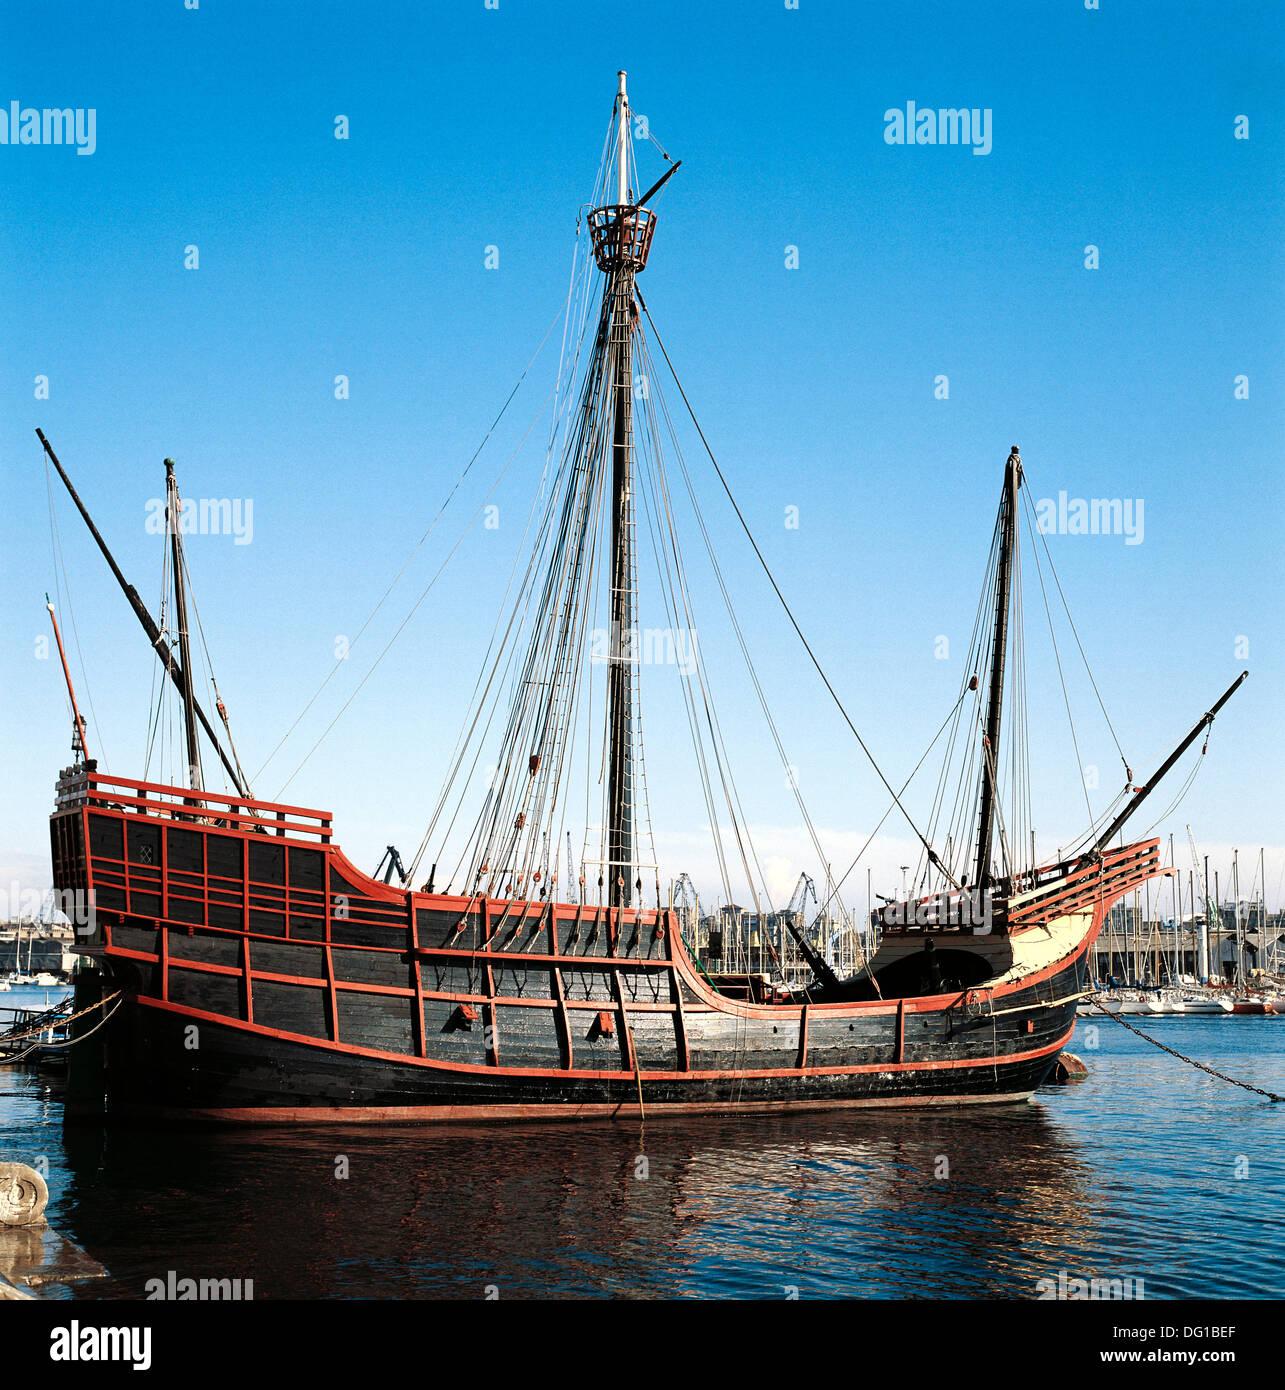 Replica of caravel Santa Maria at port, Barcelona. Catalonia, Spain - Stock Image